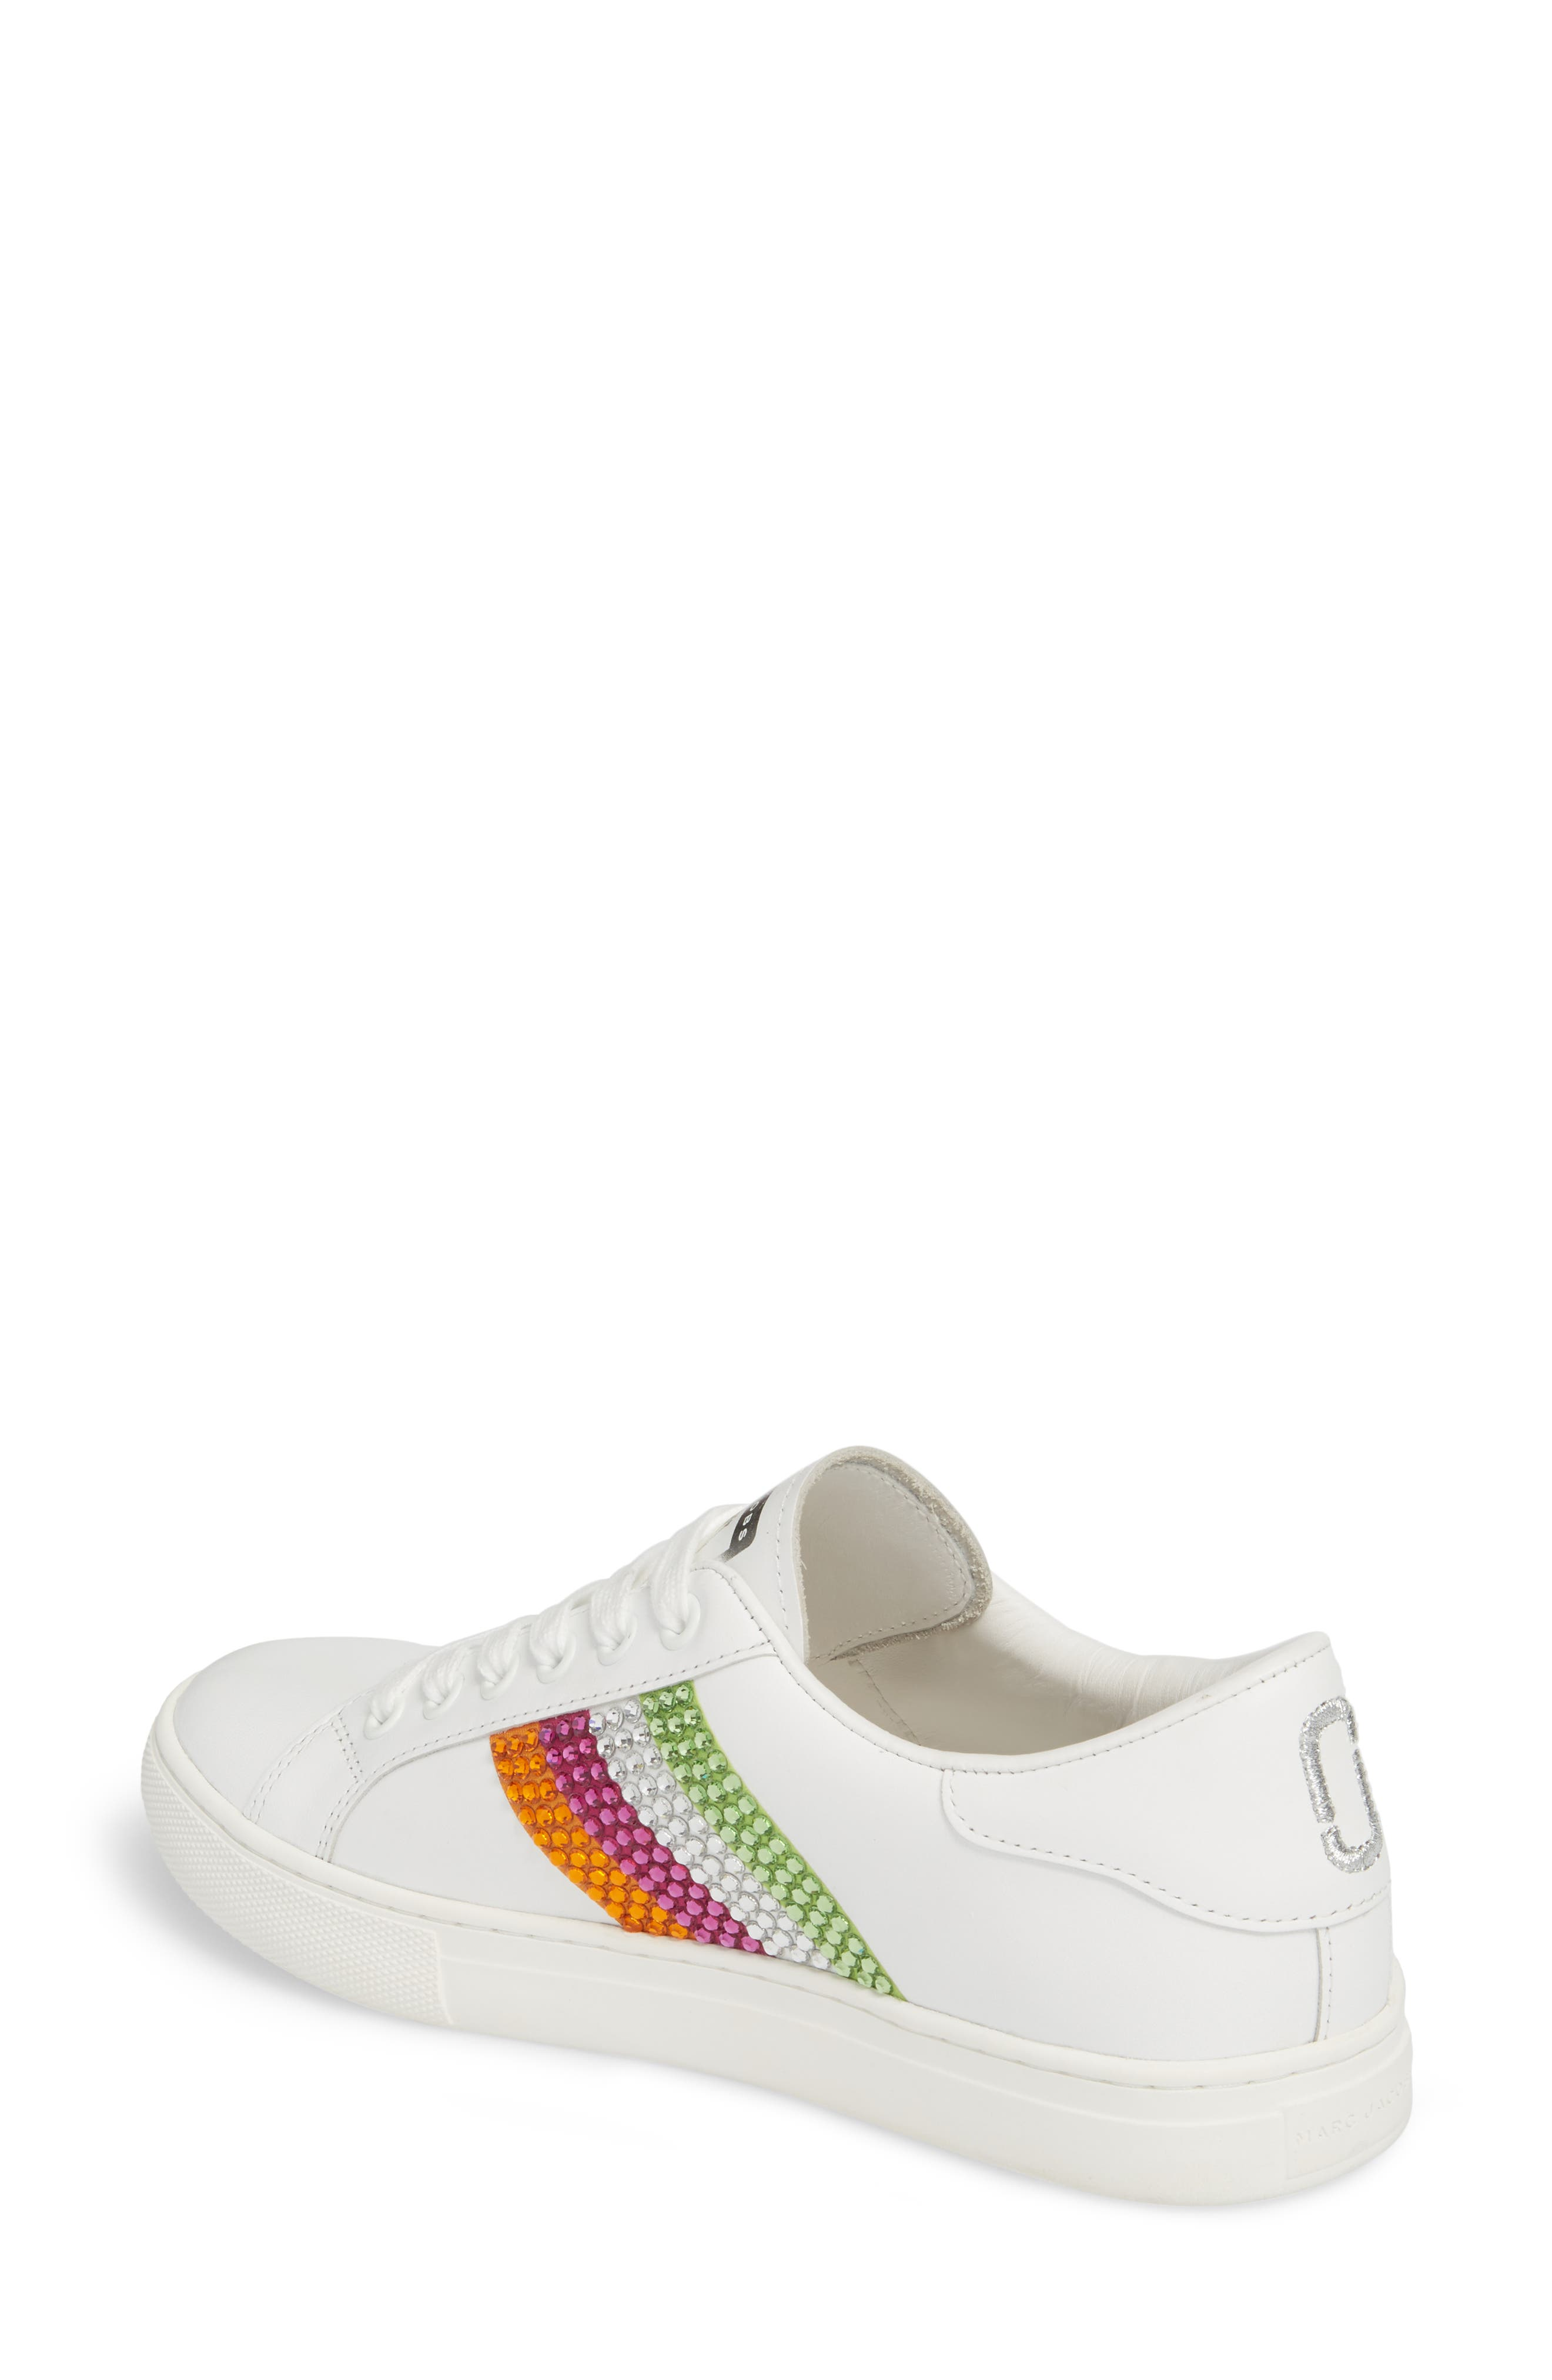 Alternate Image 2  - MARC JACOBS Empire Crystal Embellished Sneaker (Women)